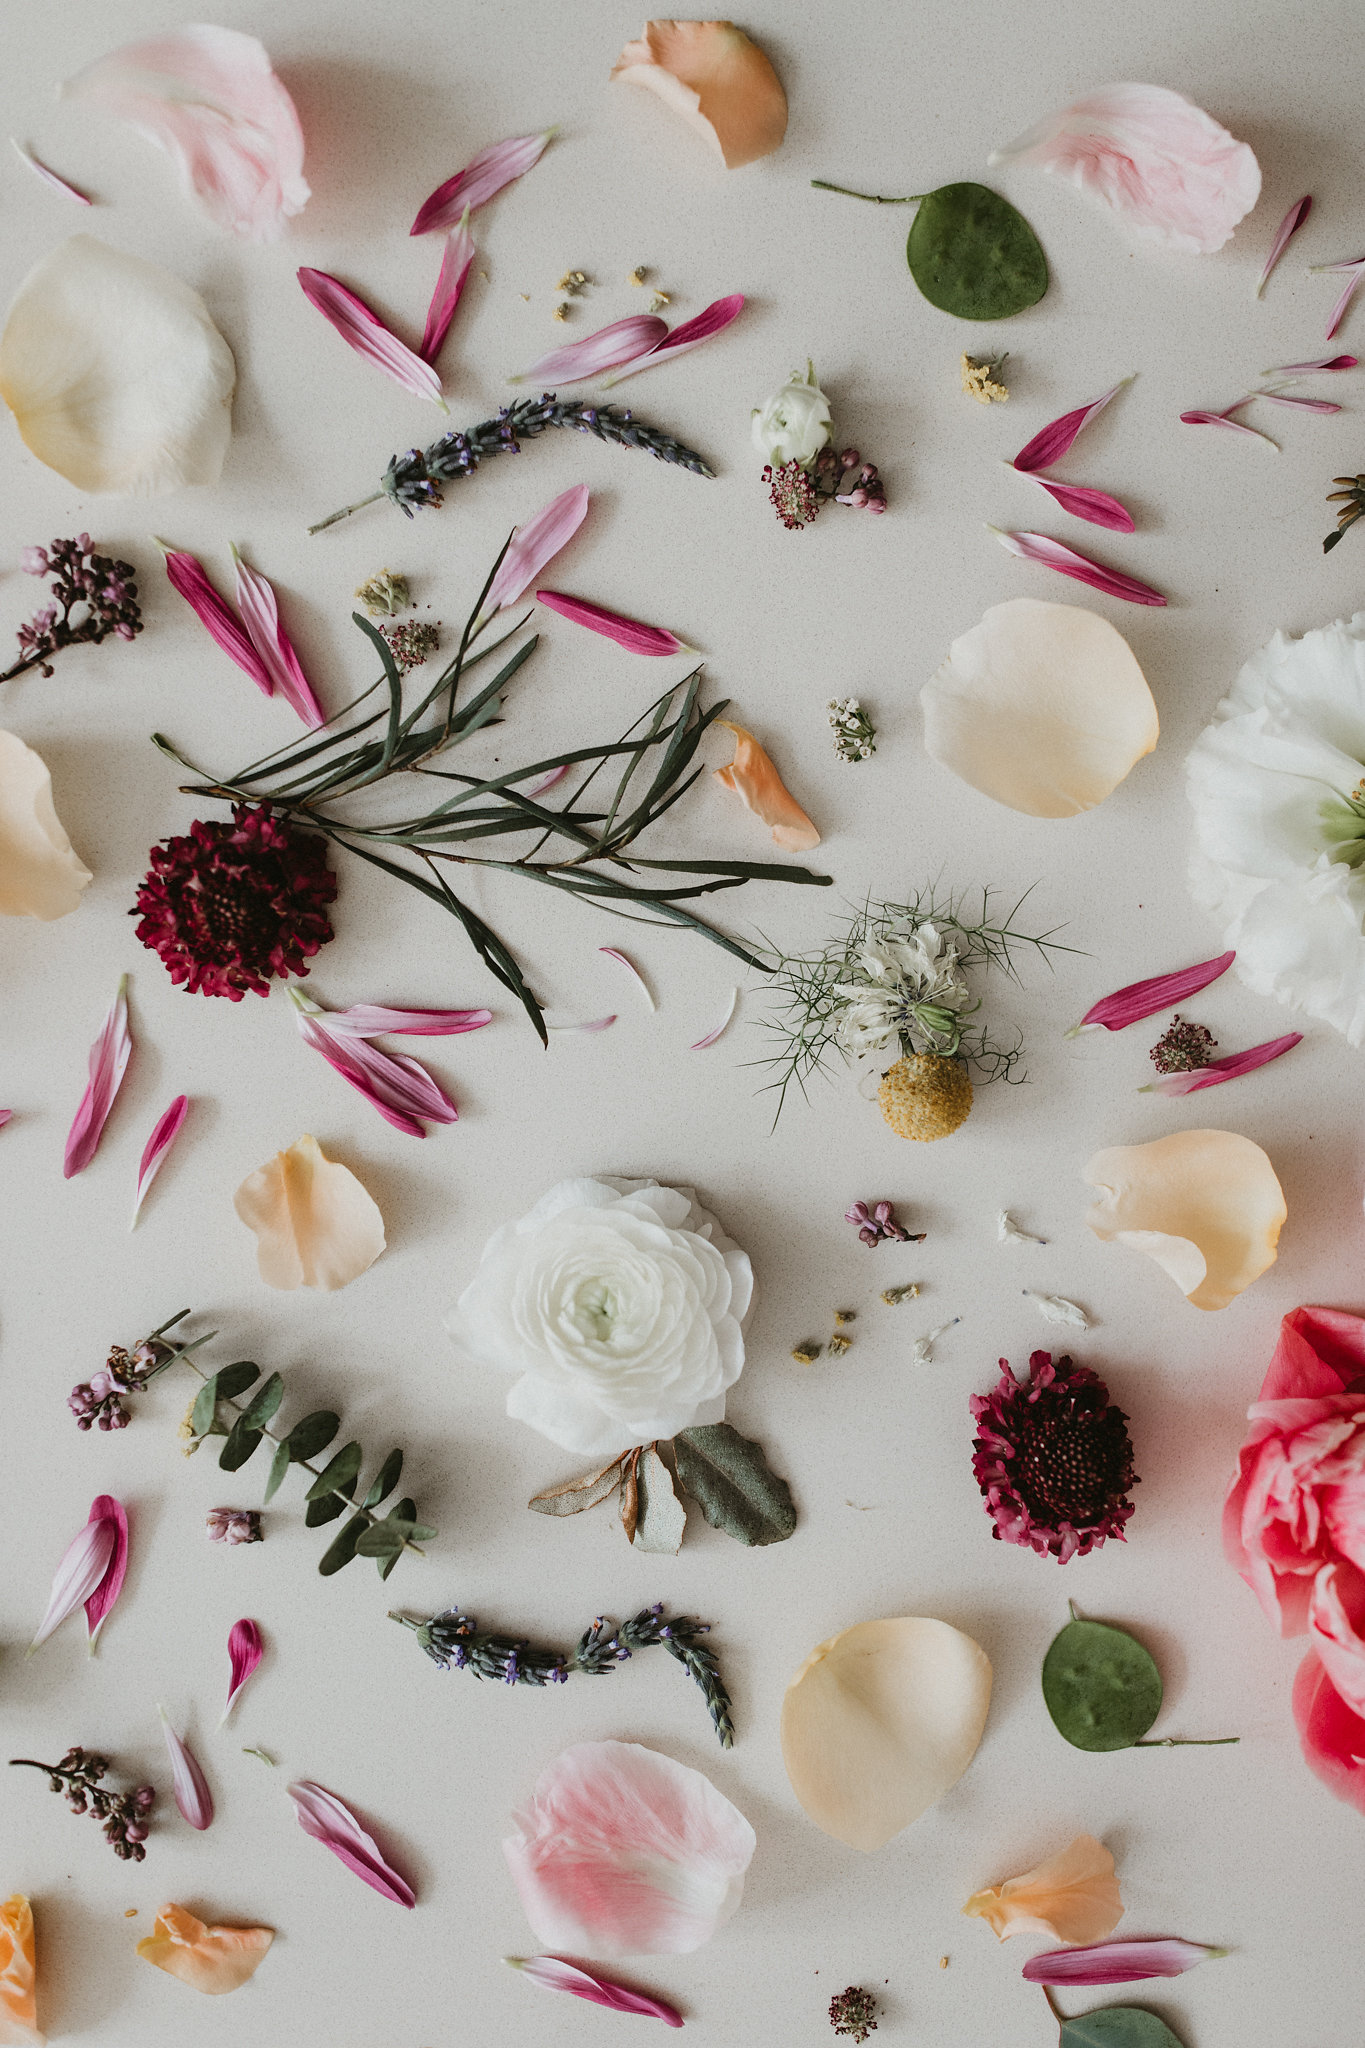 styling details wedding planner epoch co floral phone backdrop wallpaper